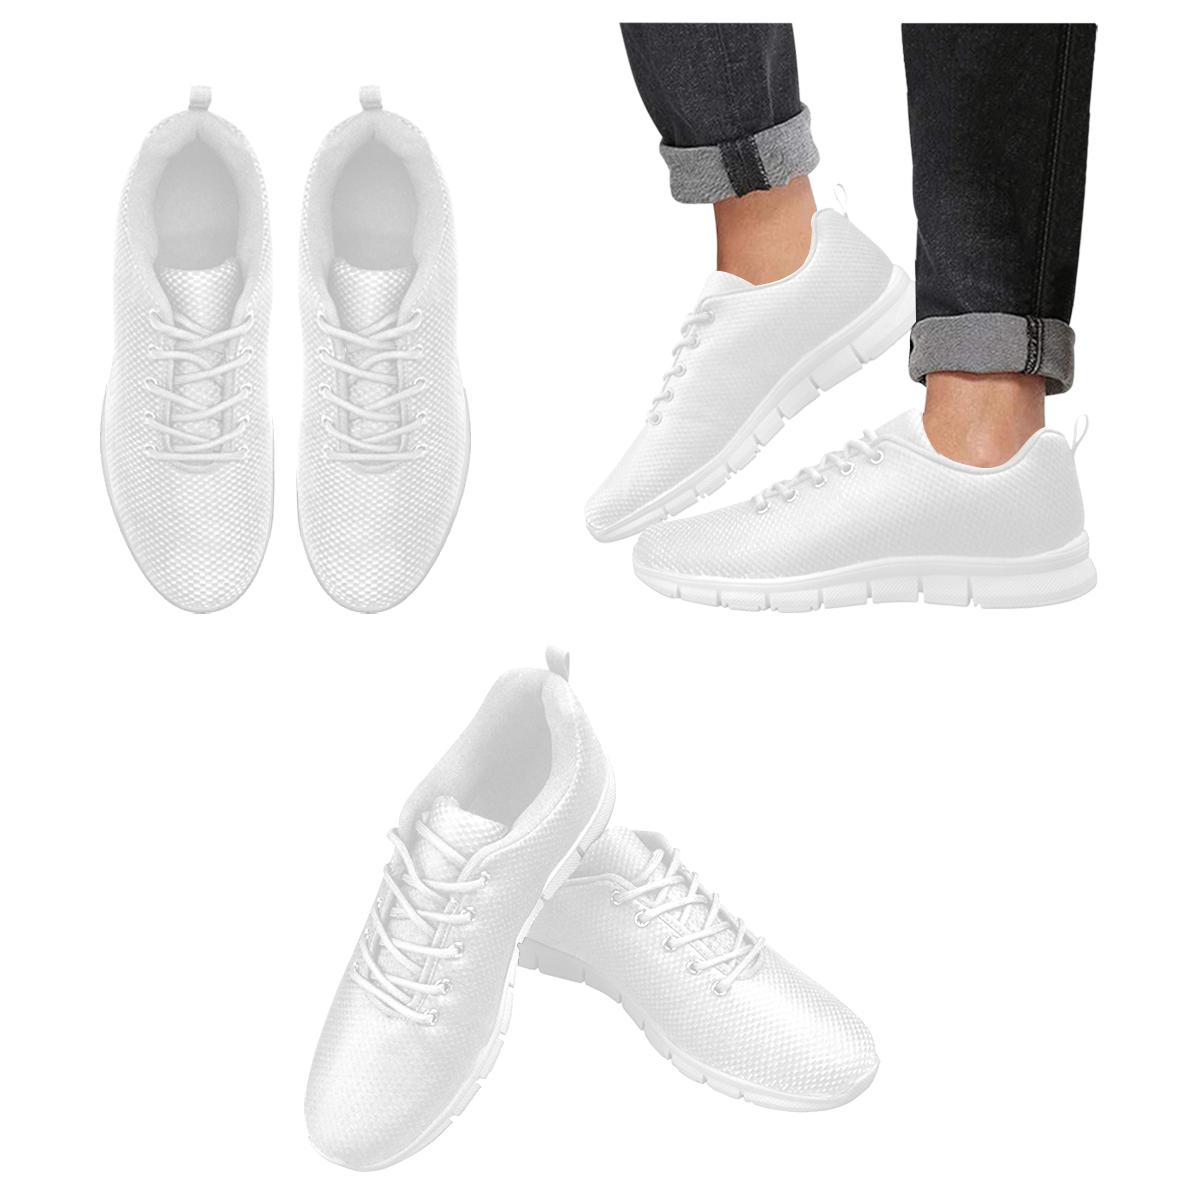 Men's Breathable Running Shoes/Large (Model 055)